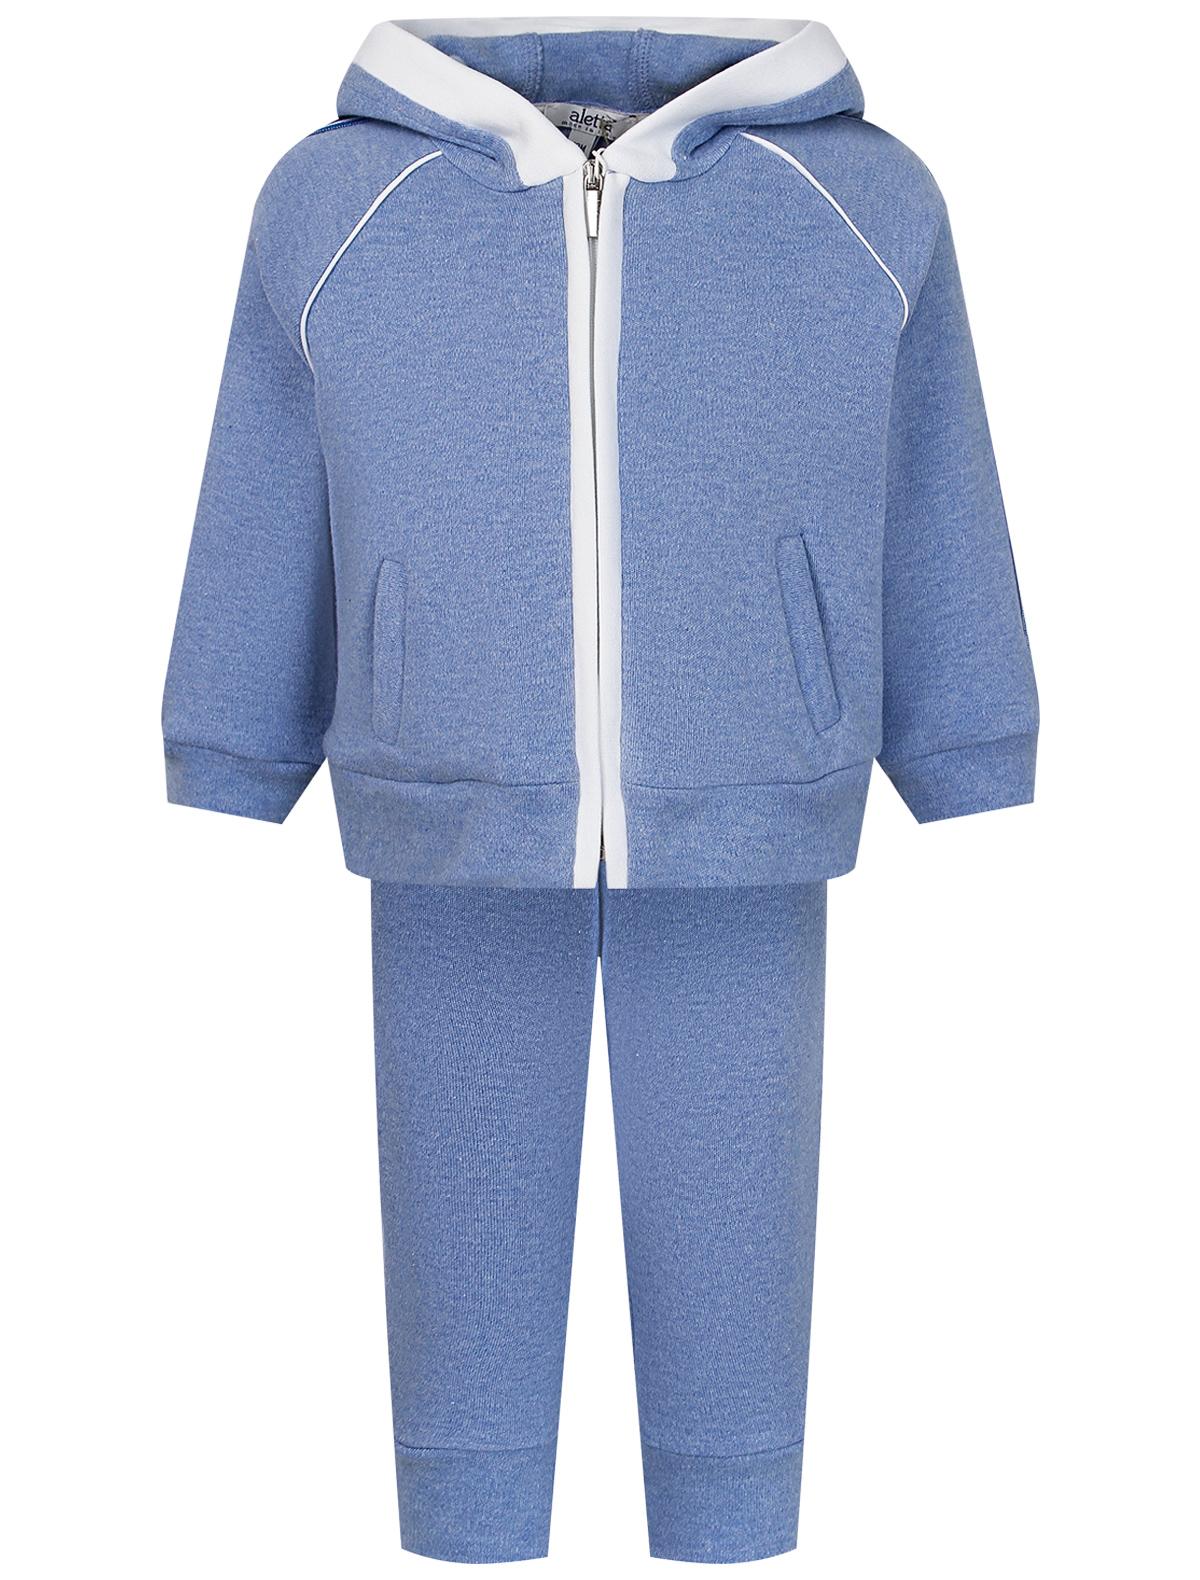 Костюм спортивный Aletta голубого цвета